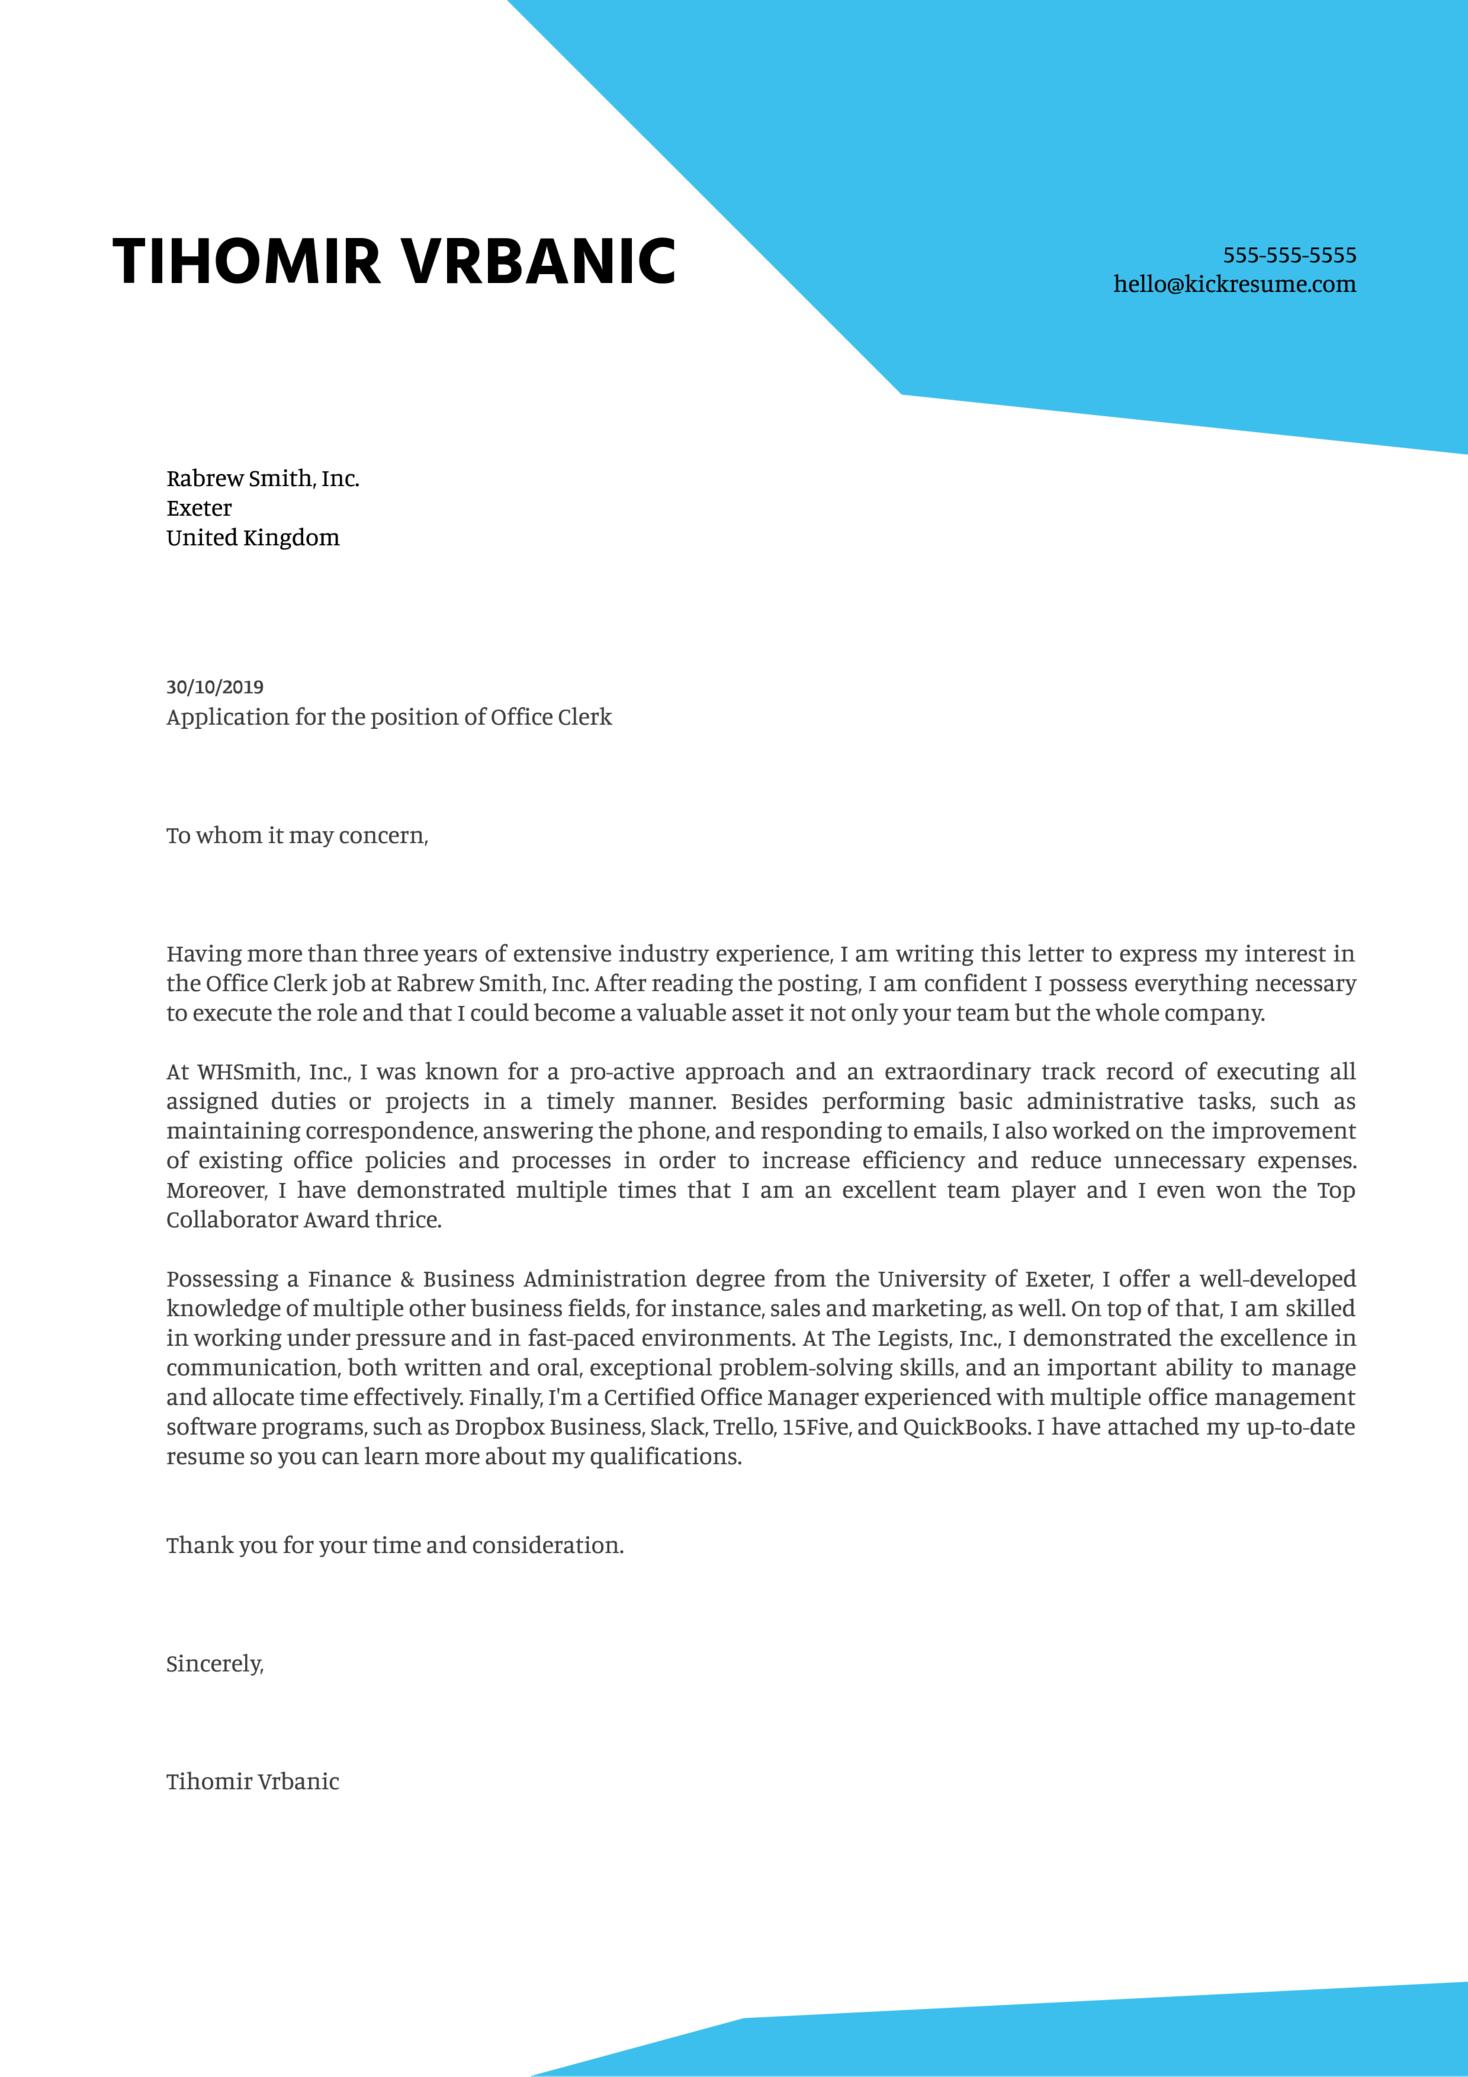 Office Clerk Cover Letter Example